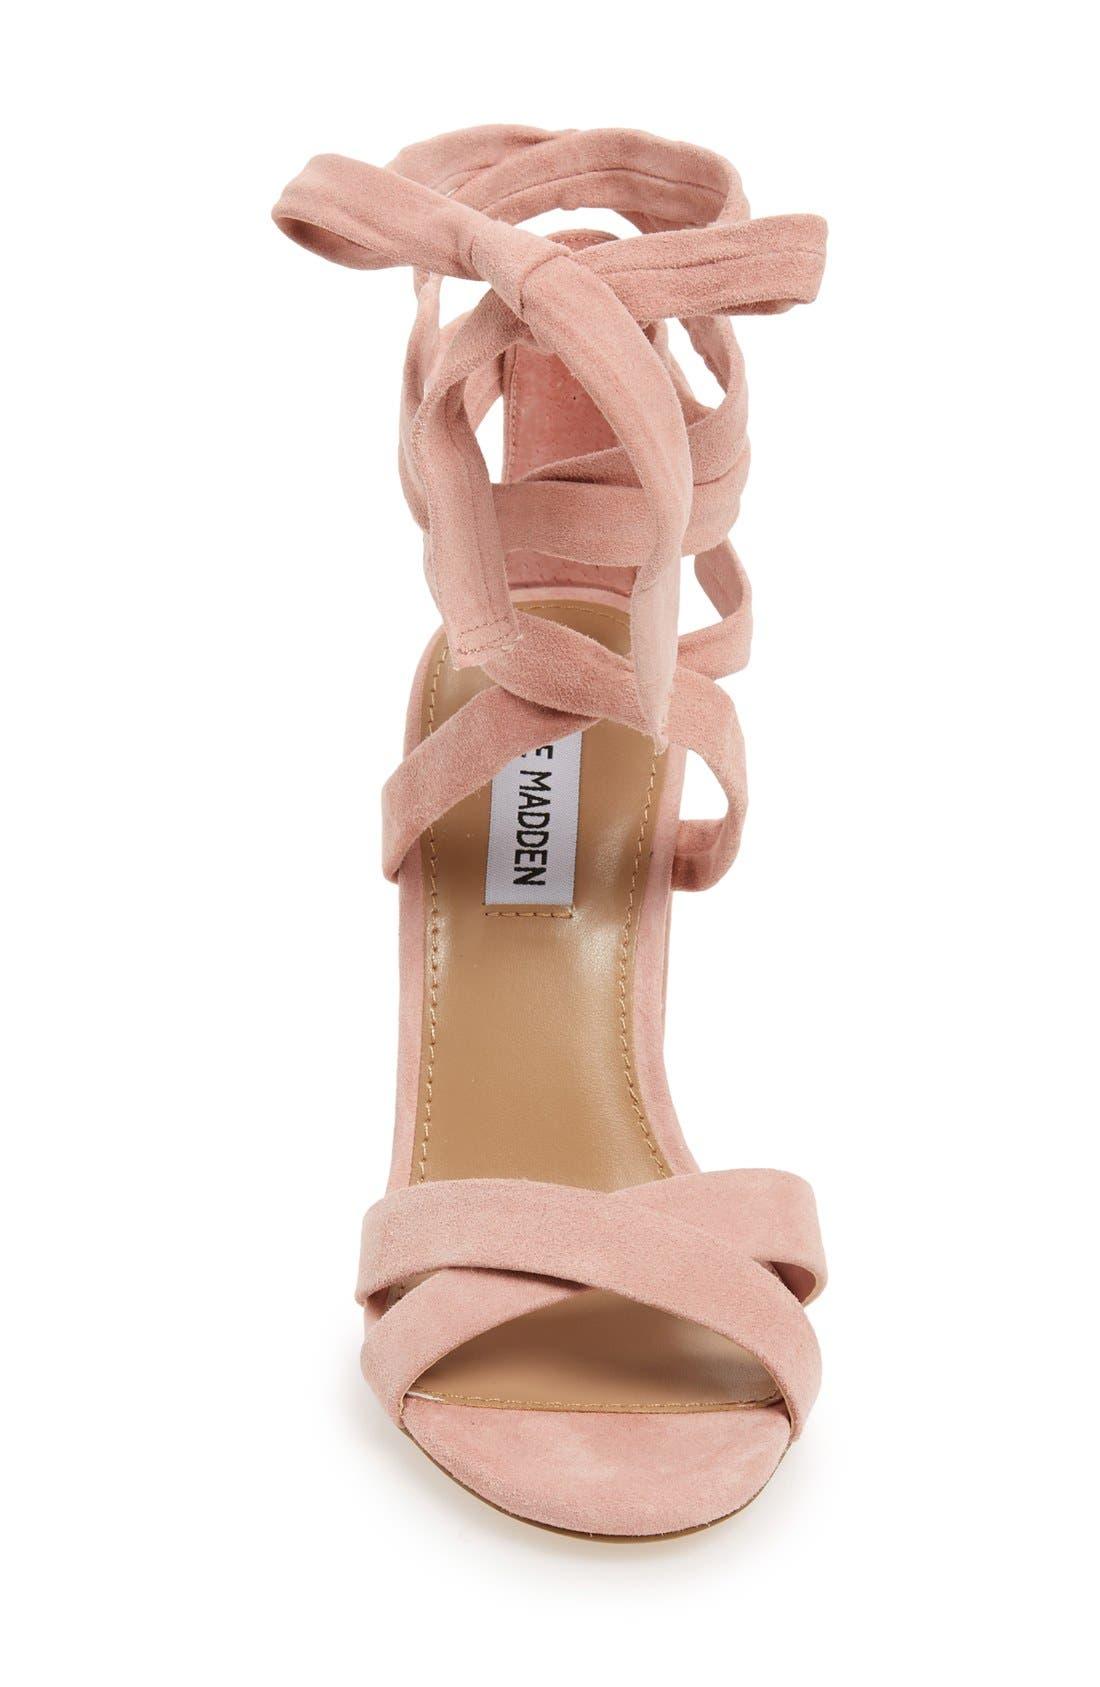 'Christey' Wraparound Ankle Tie Sandal,                             Alternate thumbnail 3, color,                             650